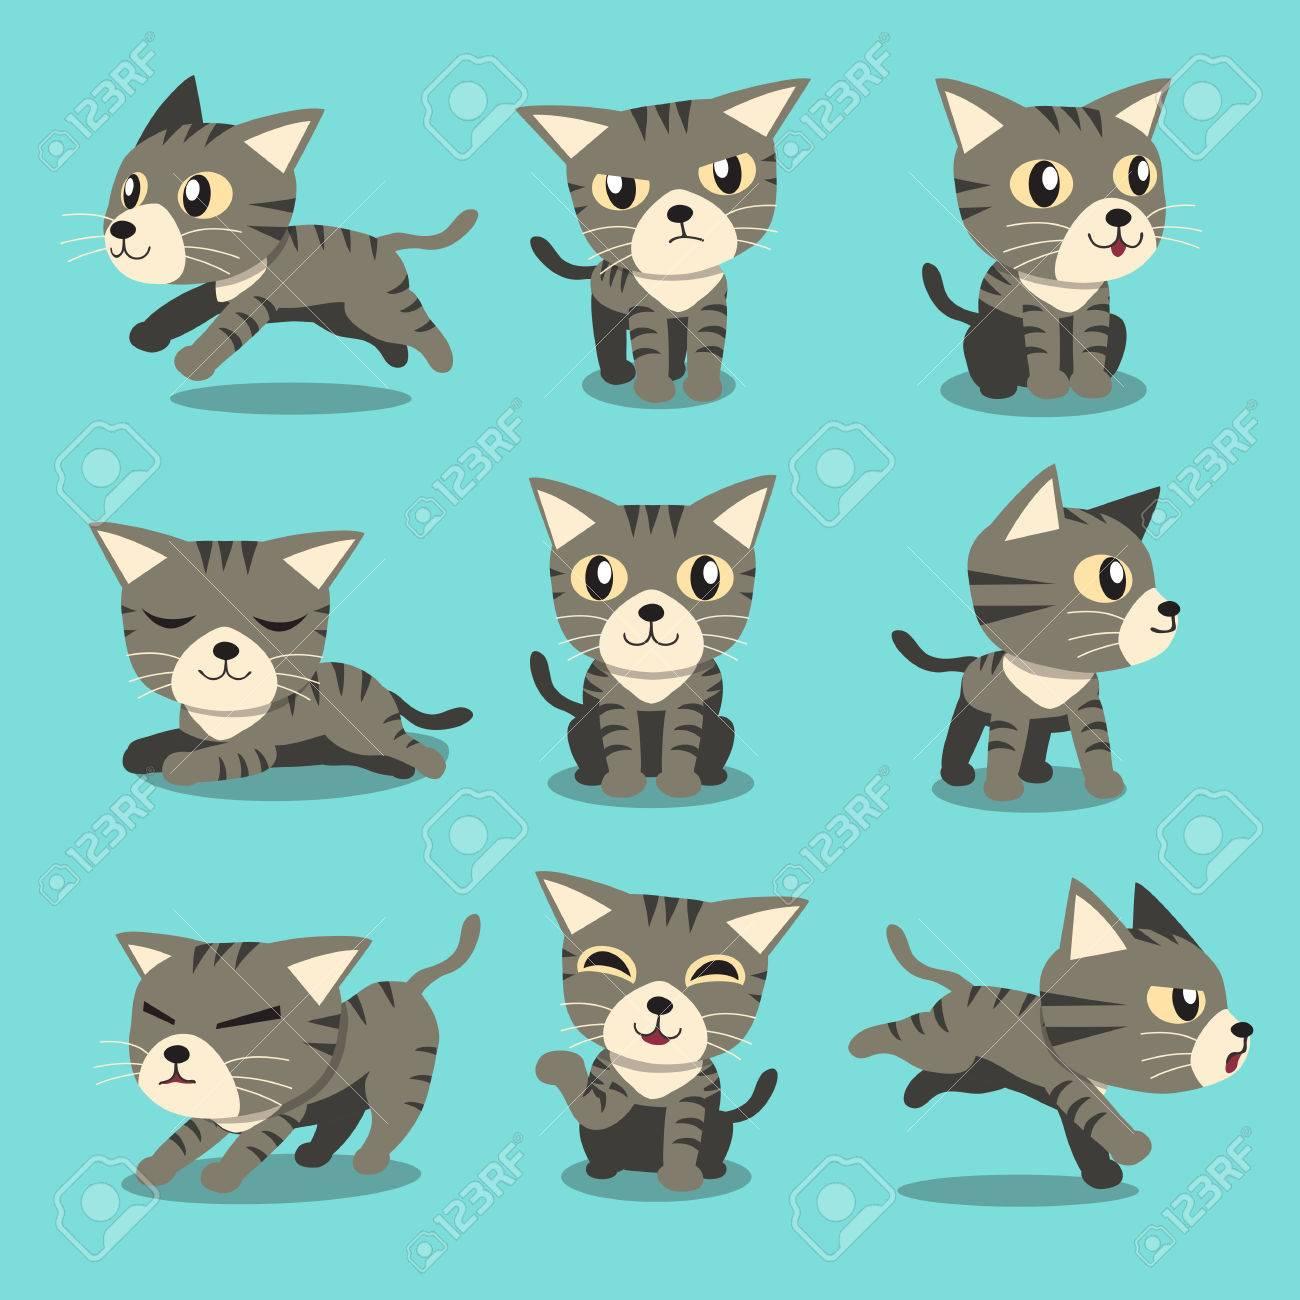 Cartoon character grey tabby cat poses - 53668841